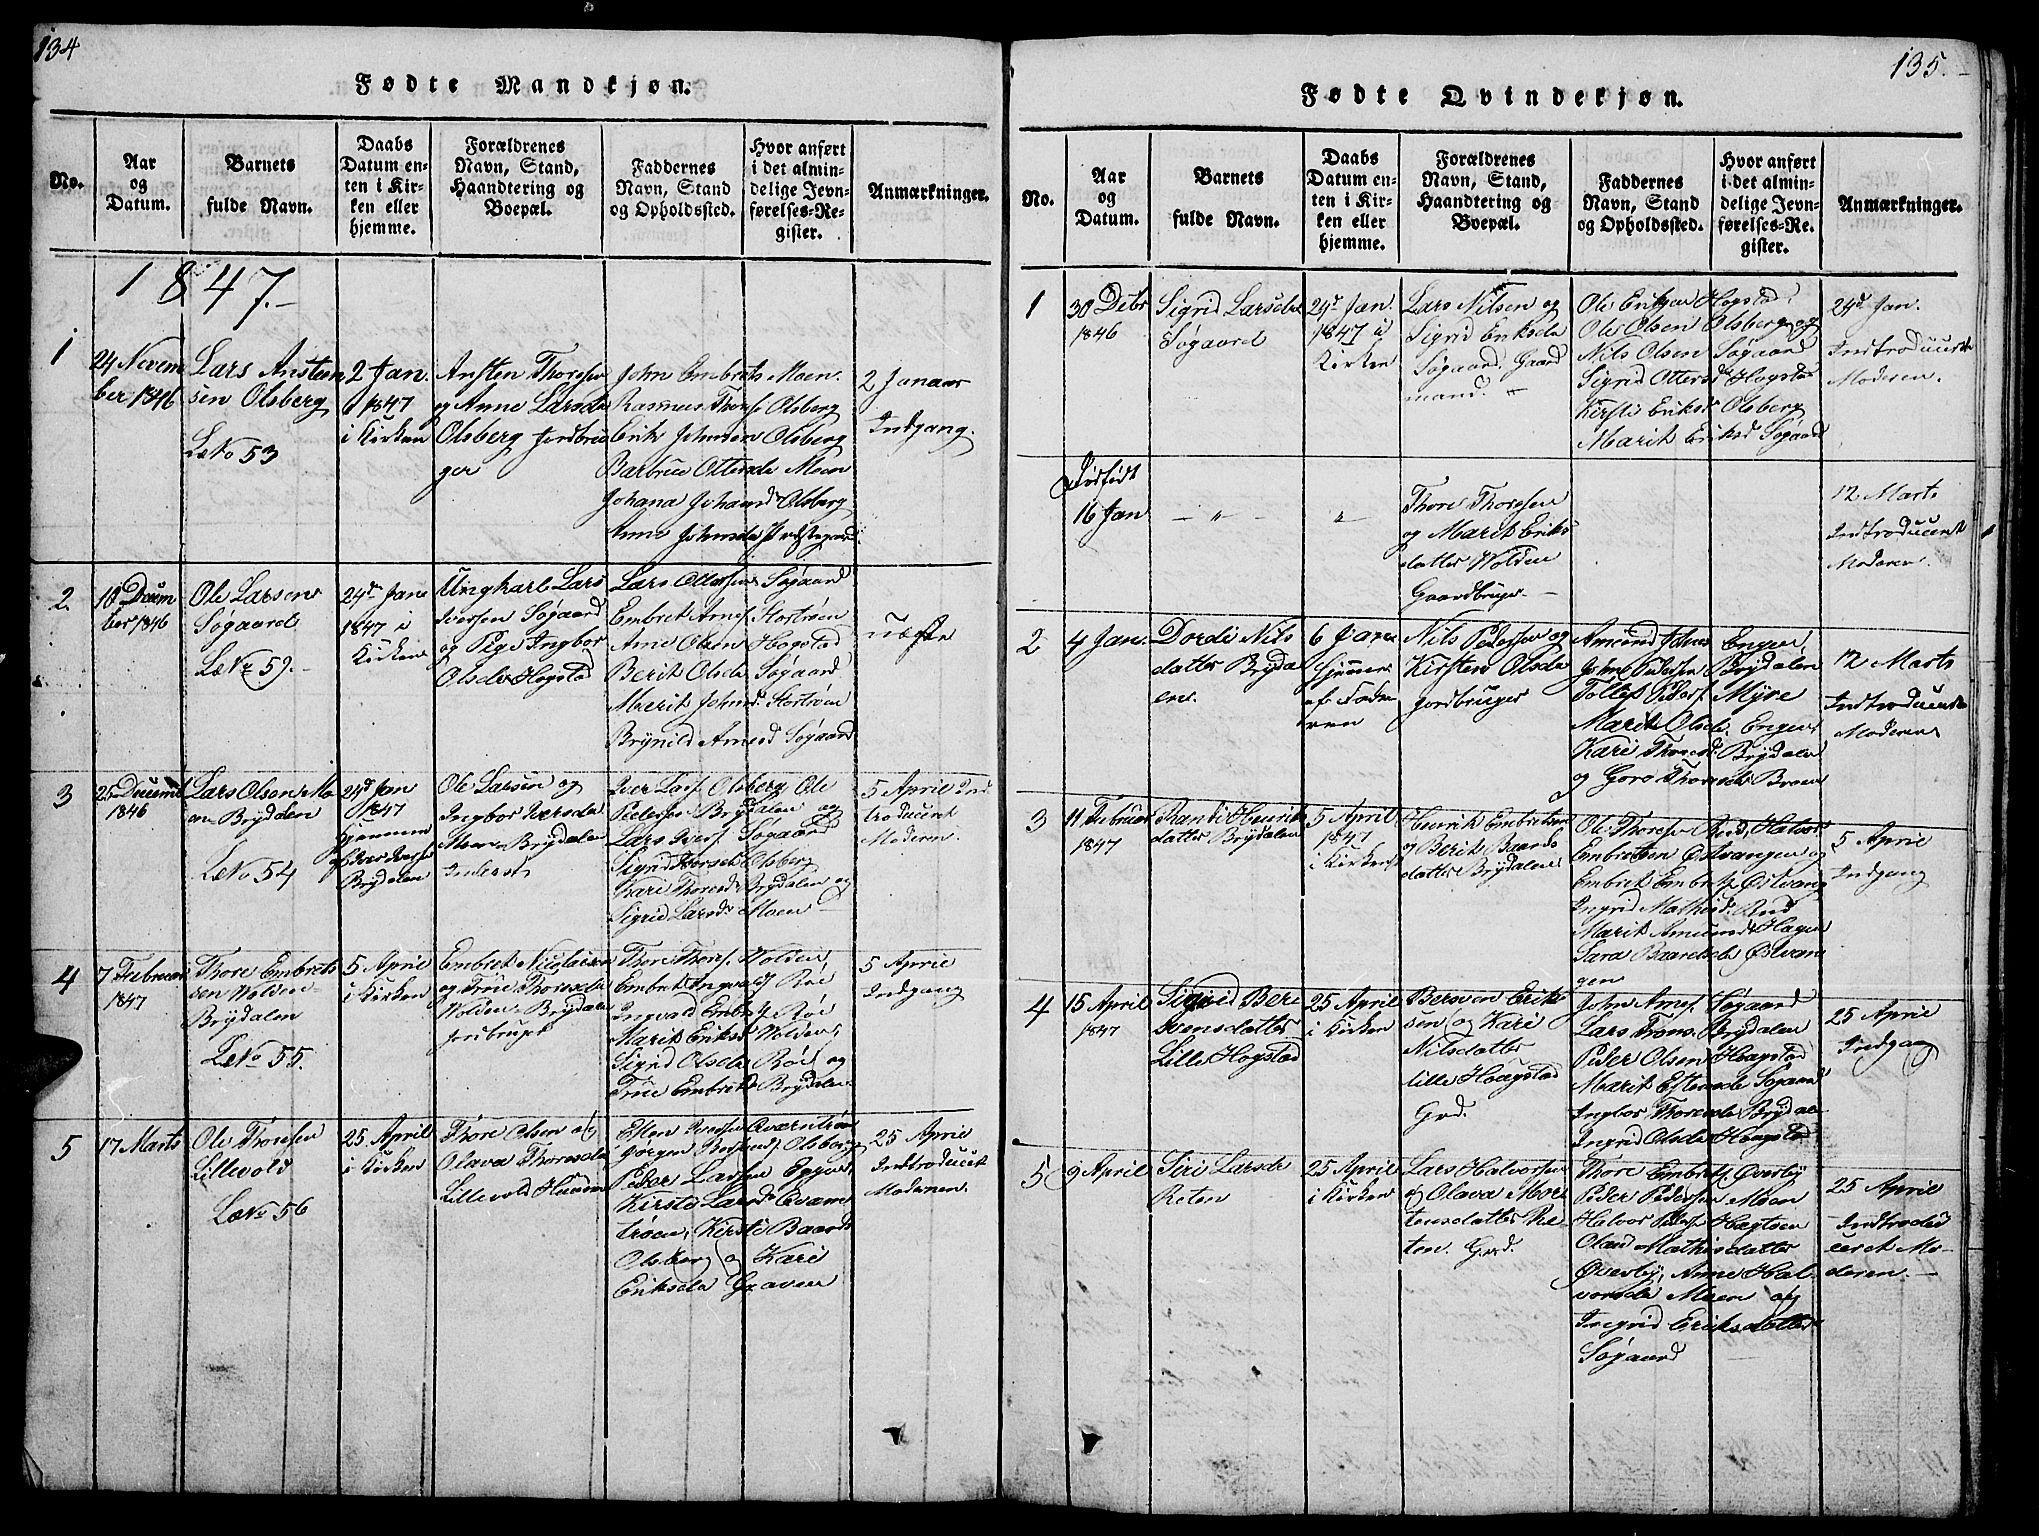 SAH, Tynset prestekontor, Klokkerbok nr. 4, 1814-1879, s. 134-135